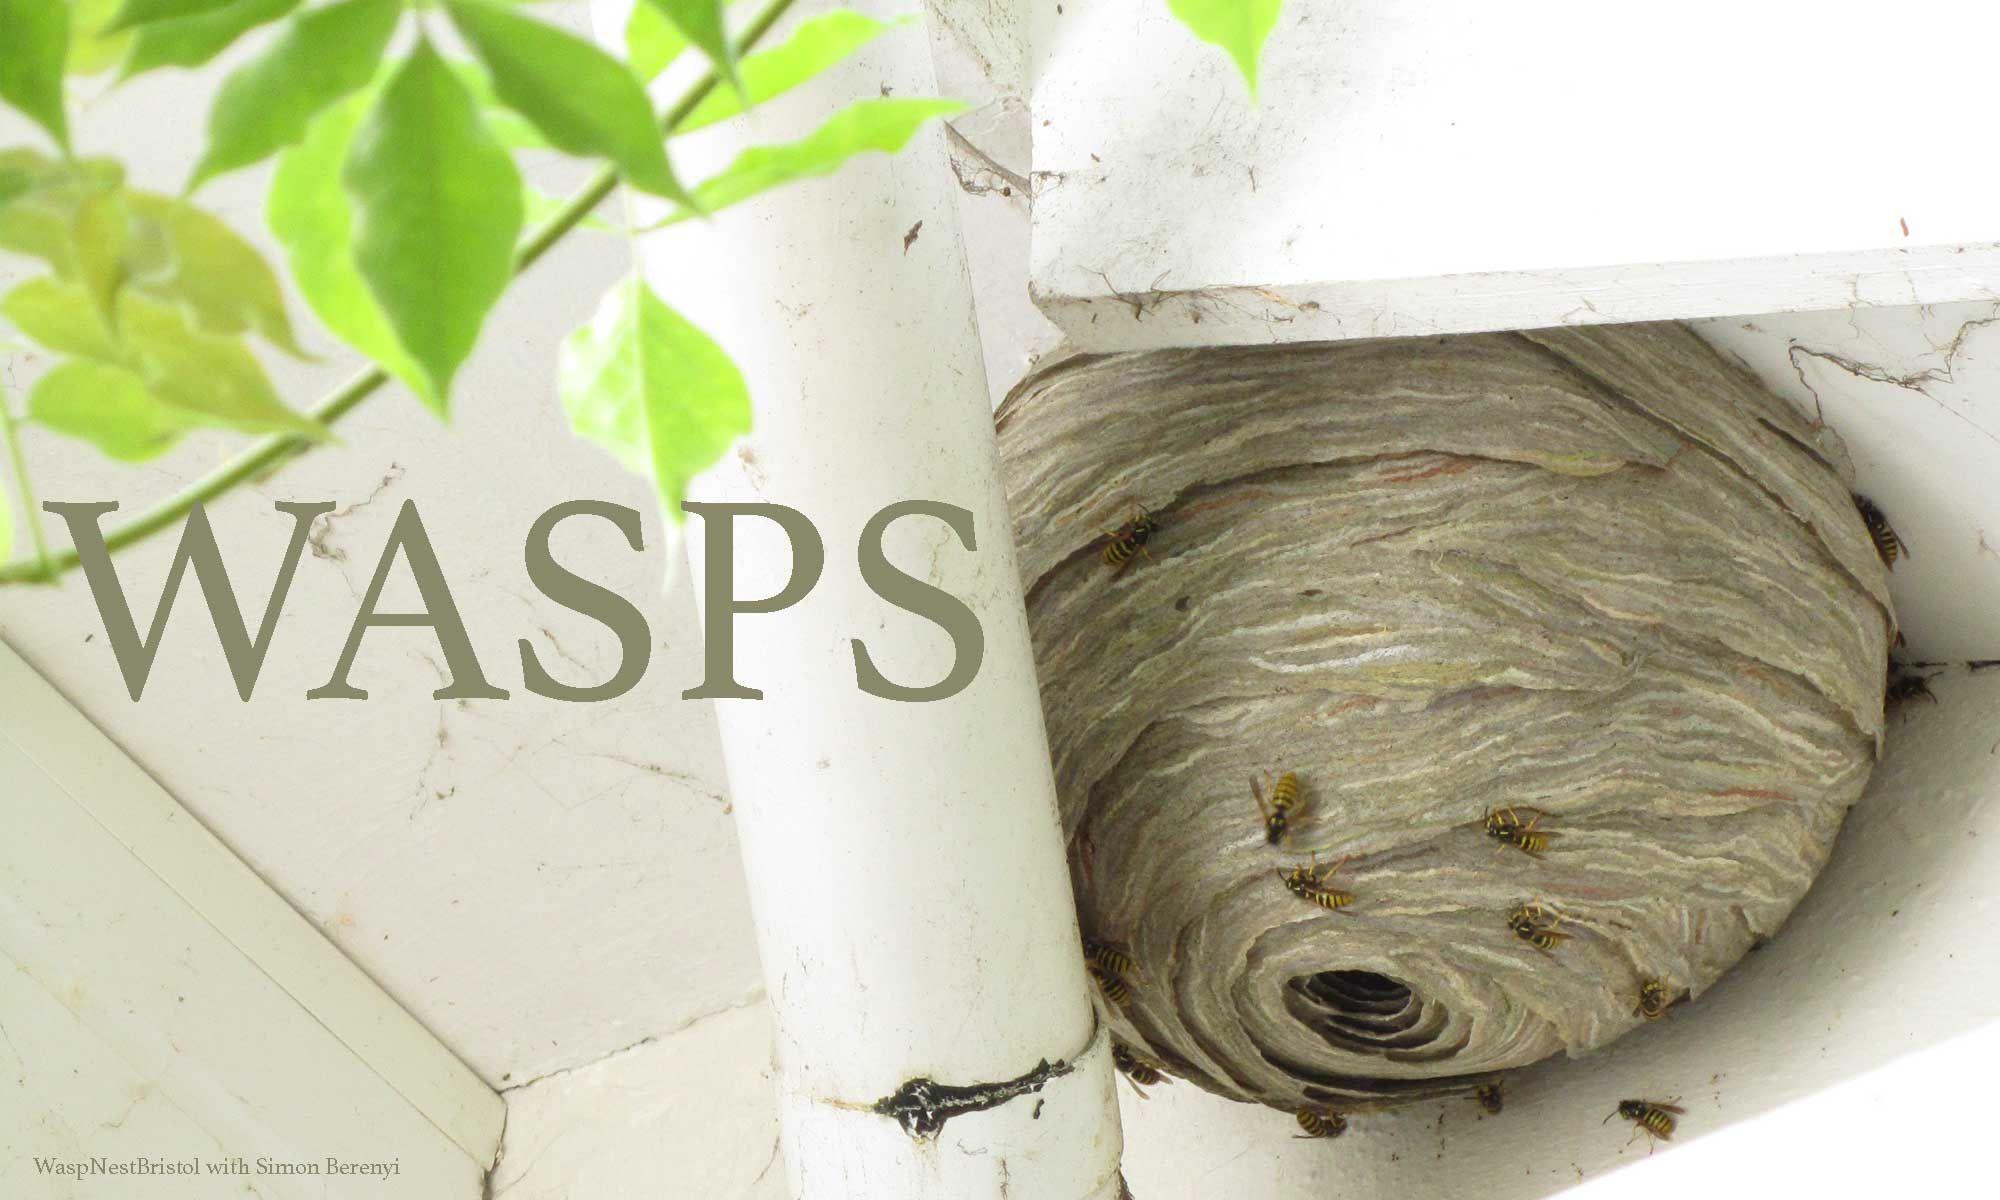 Get rid of wasps 4900 bristol wasp control